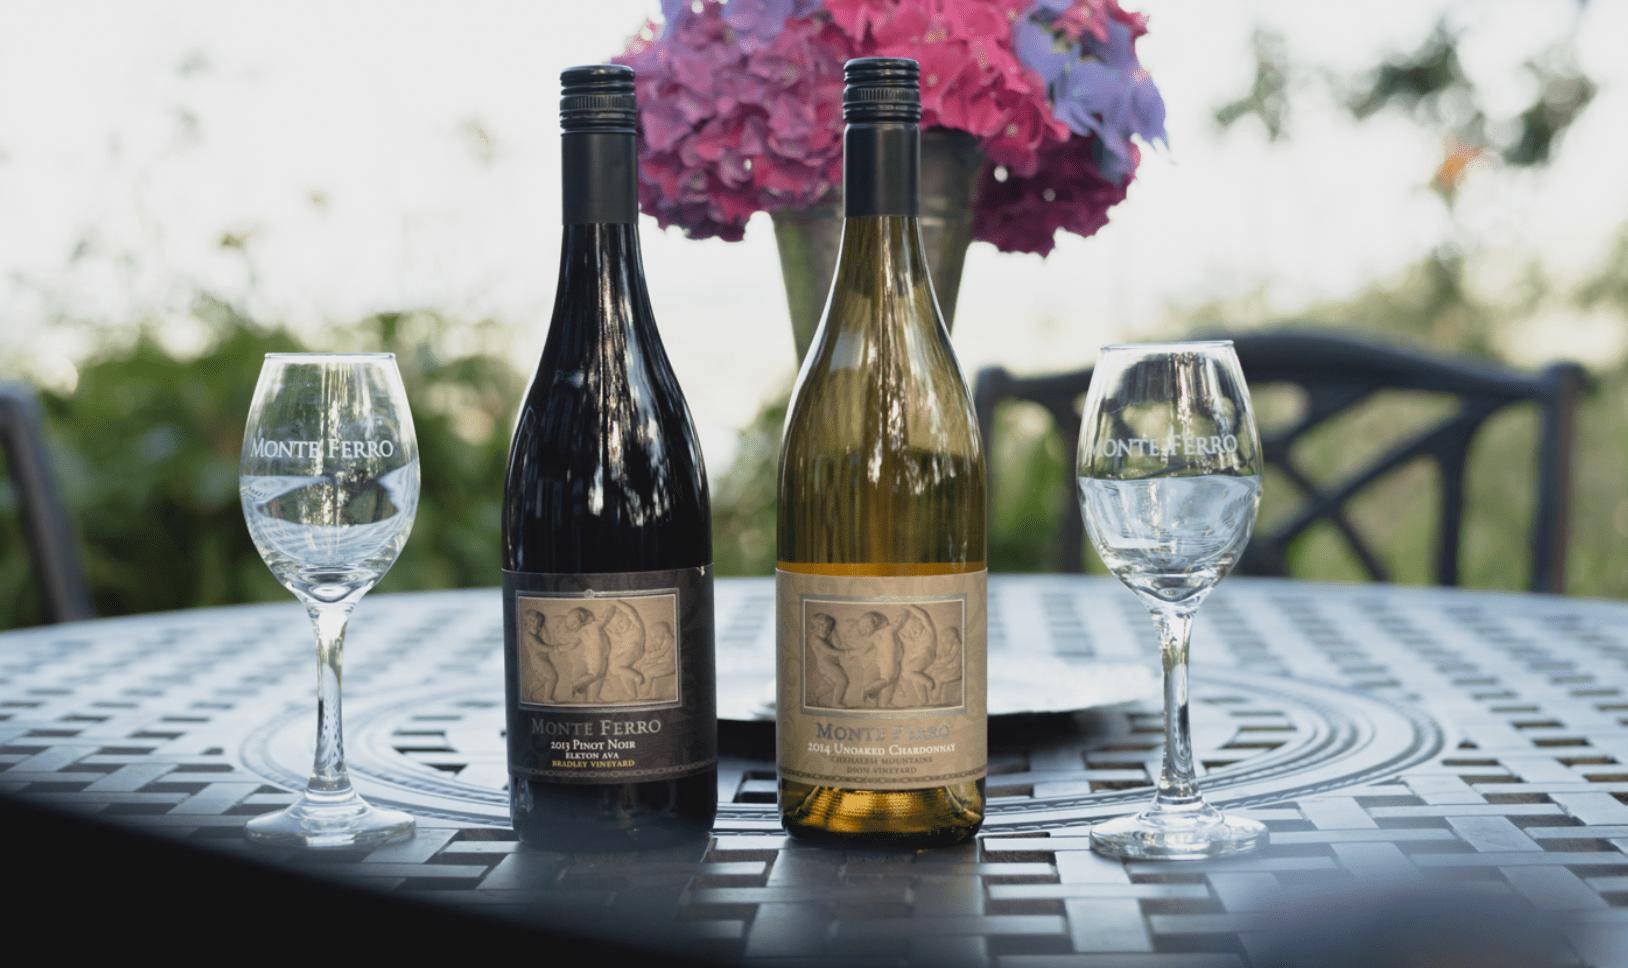 Monte Ferro Wines